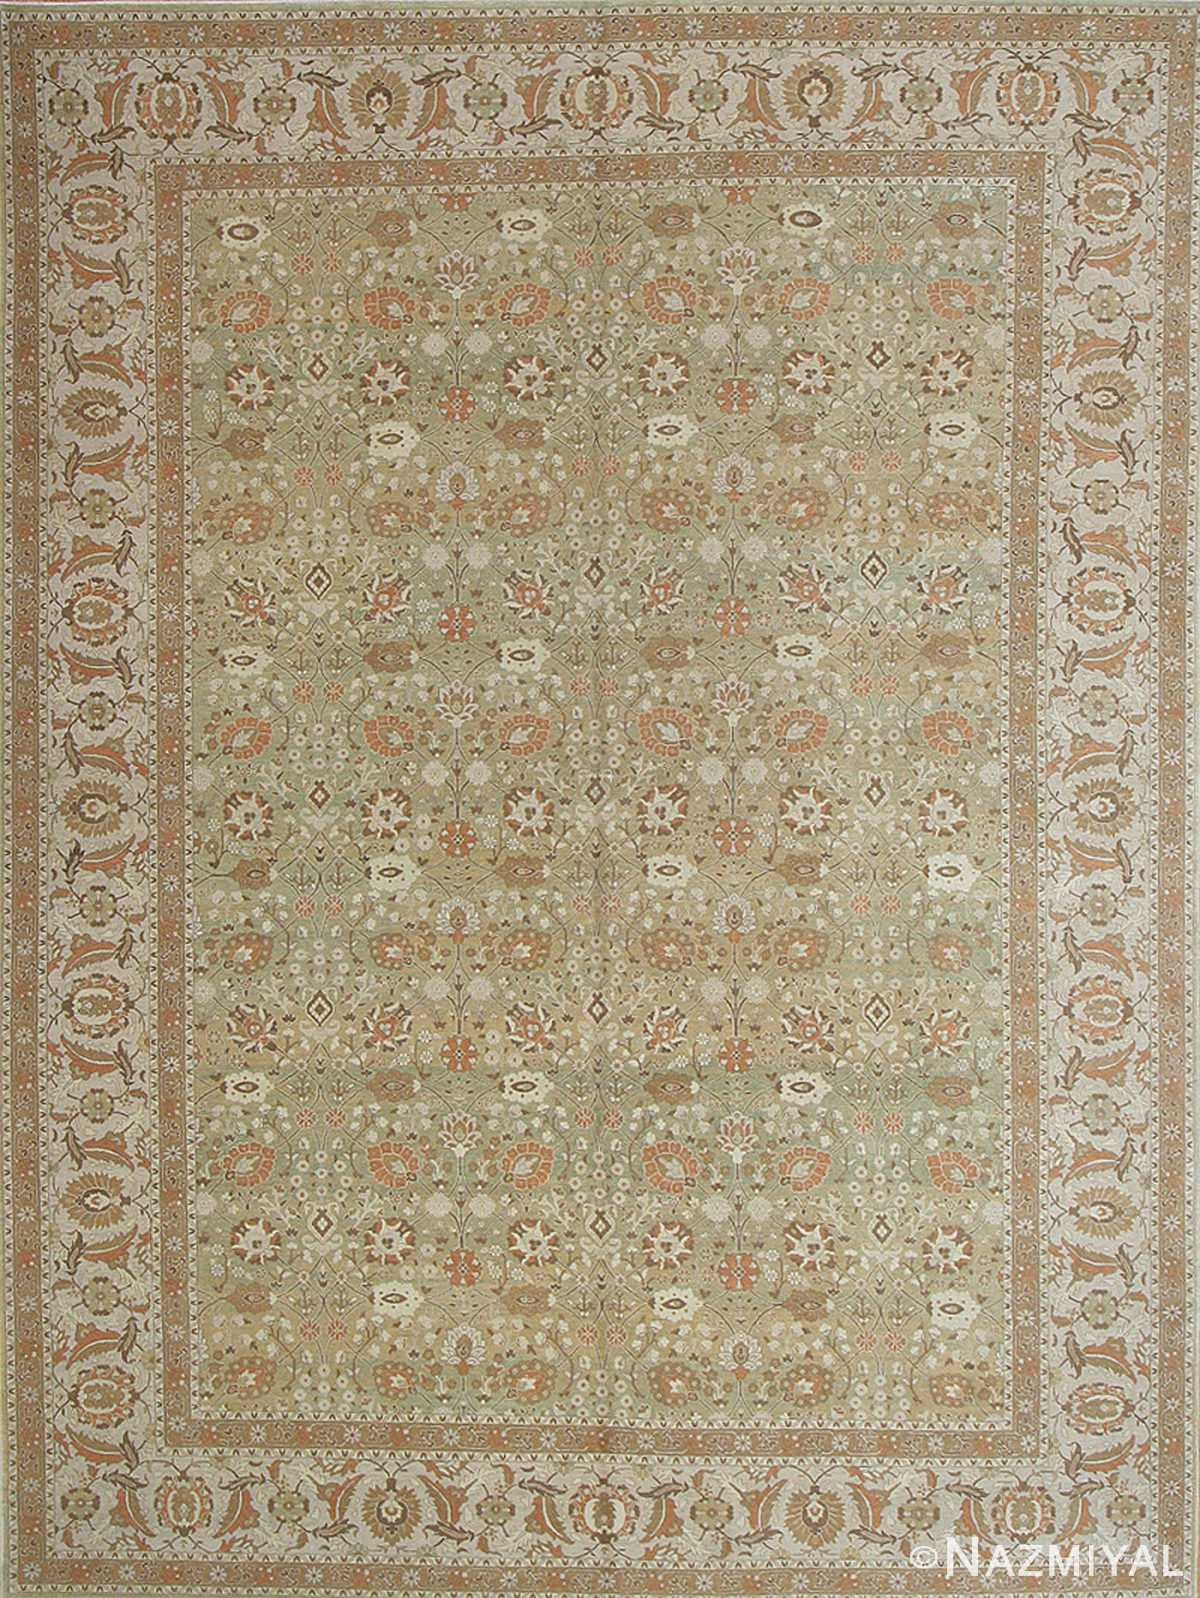 Tabriz Rug #41228 Detail/Large View